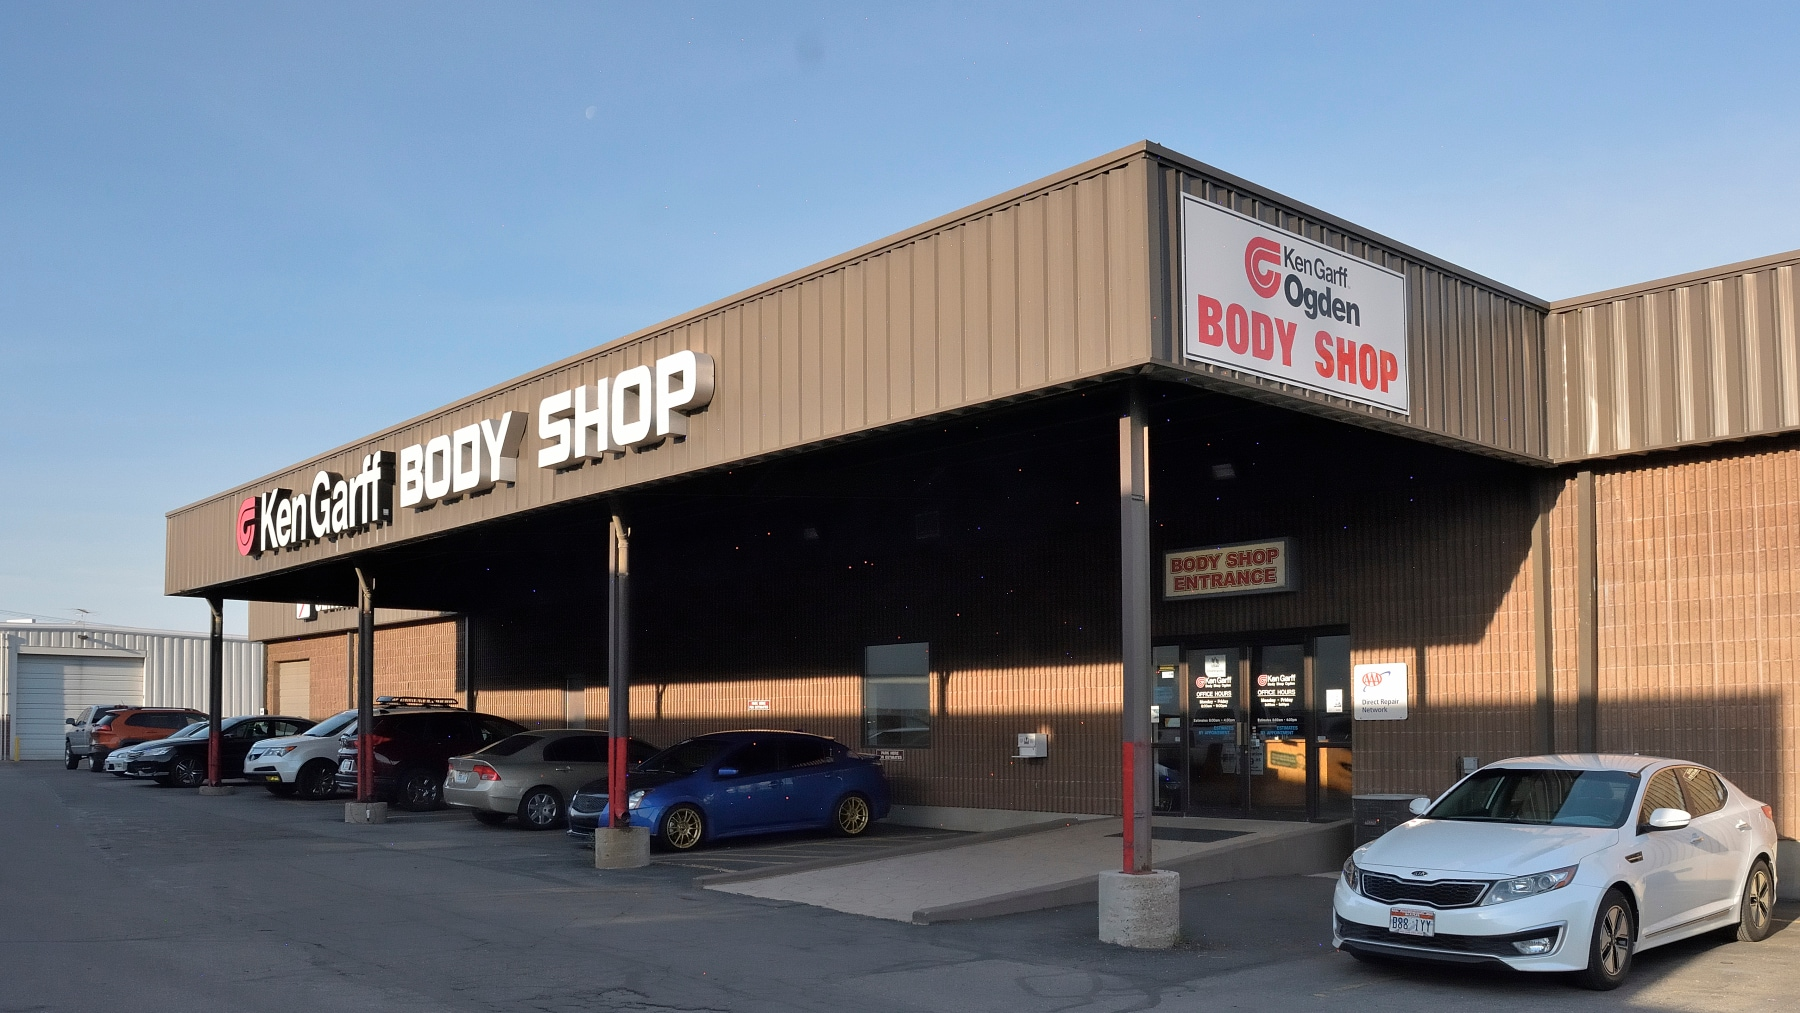 Auto Body Shop and Car Repair | Ken Garff Nissan Riverdale